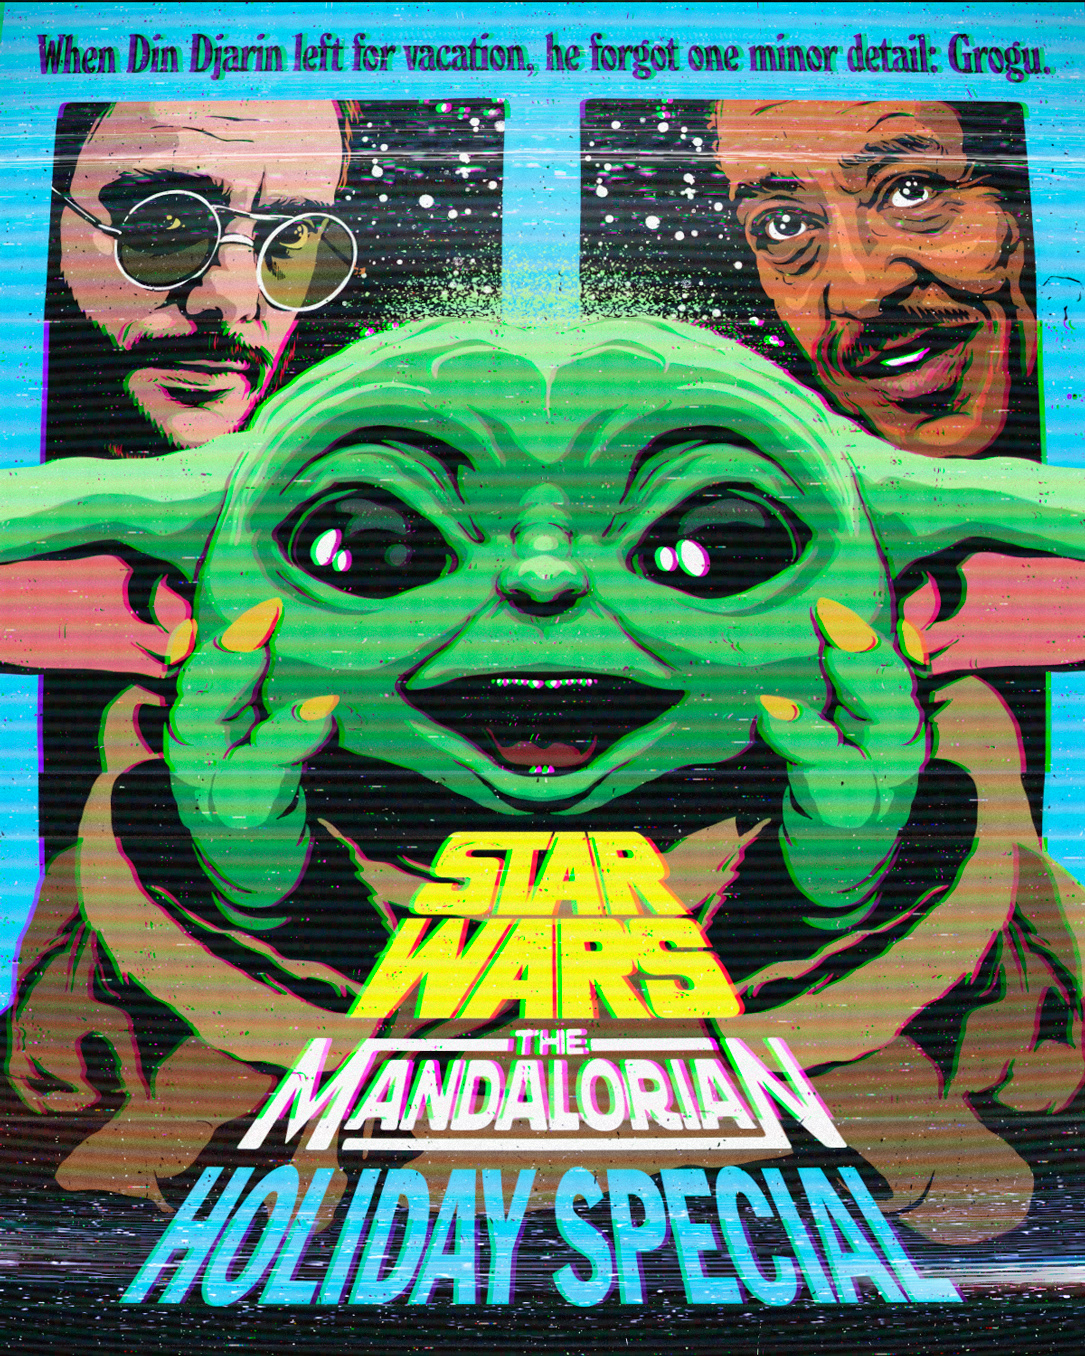 baby yoda grogu pedro pascal star wars The Mandalorian